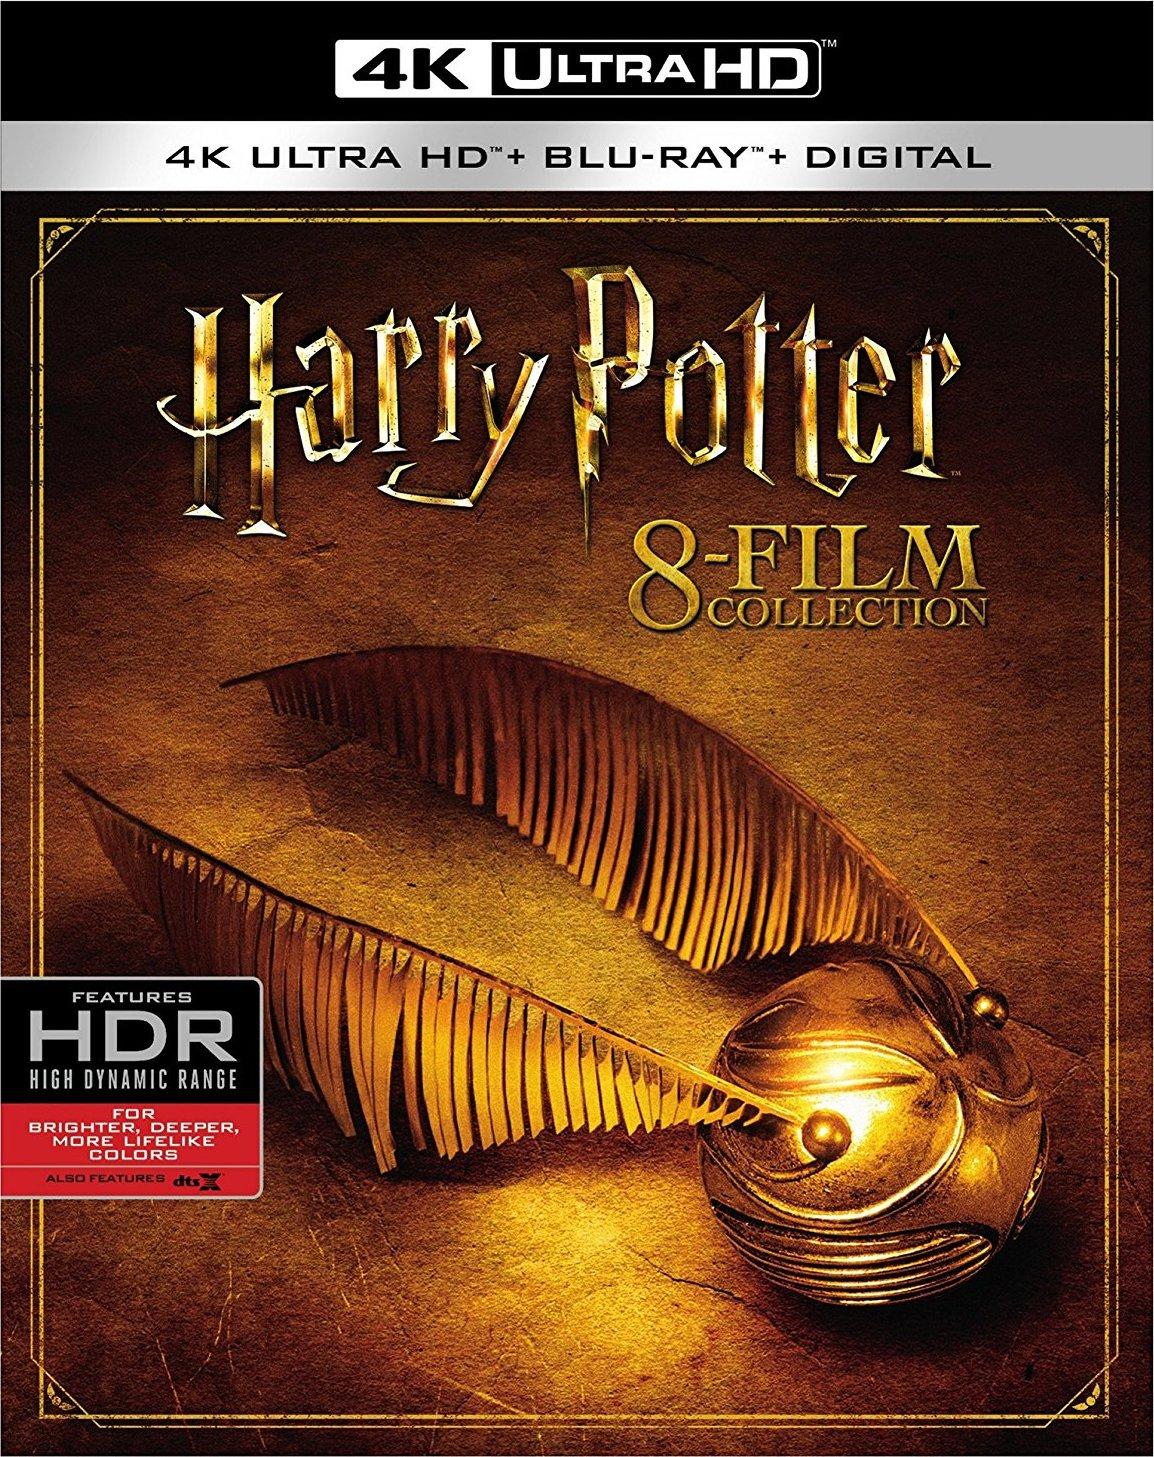 Harry Potter: 8-Film Collection 4K (2001-2011) UHD Ultra HD Blu-ray